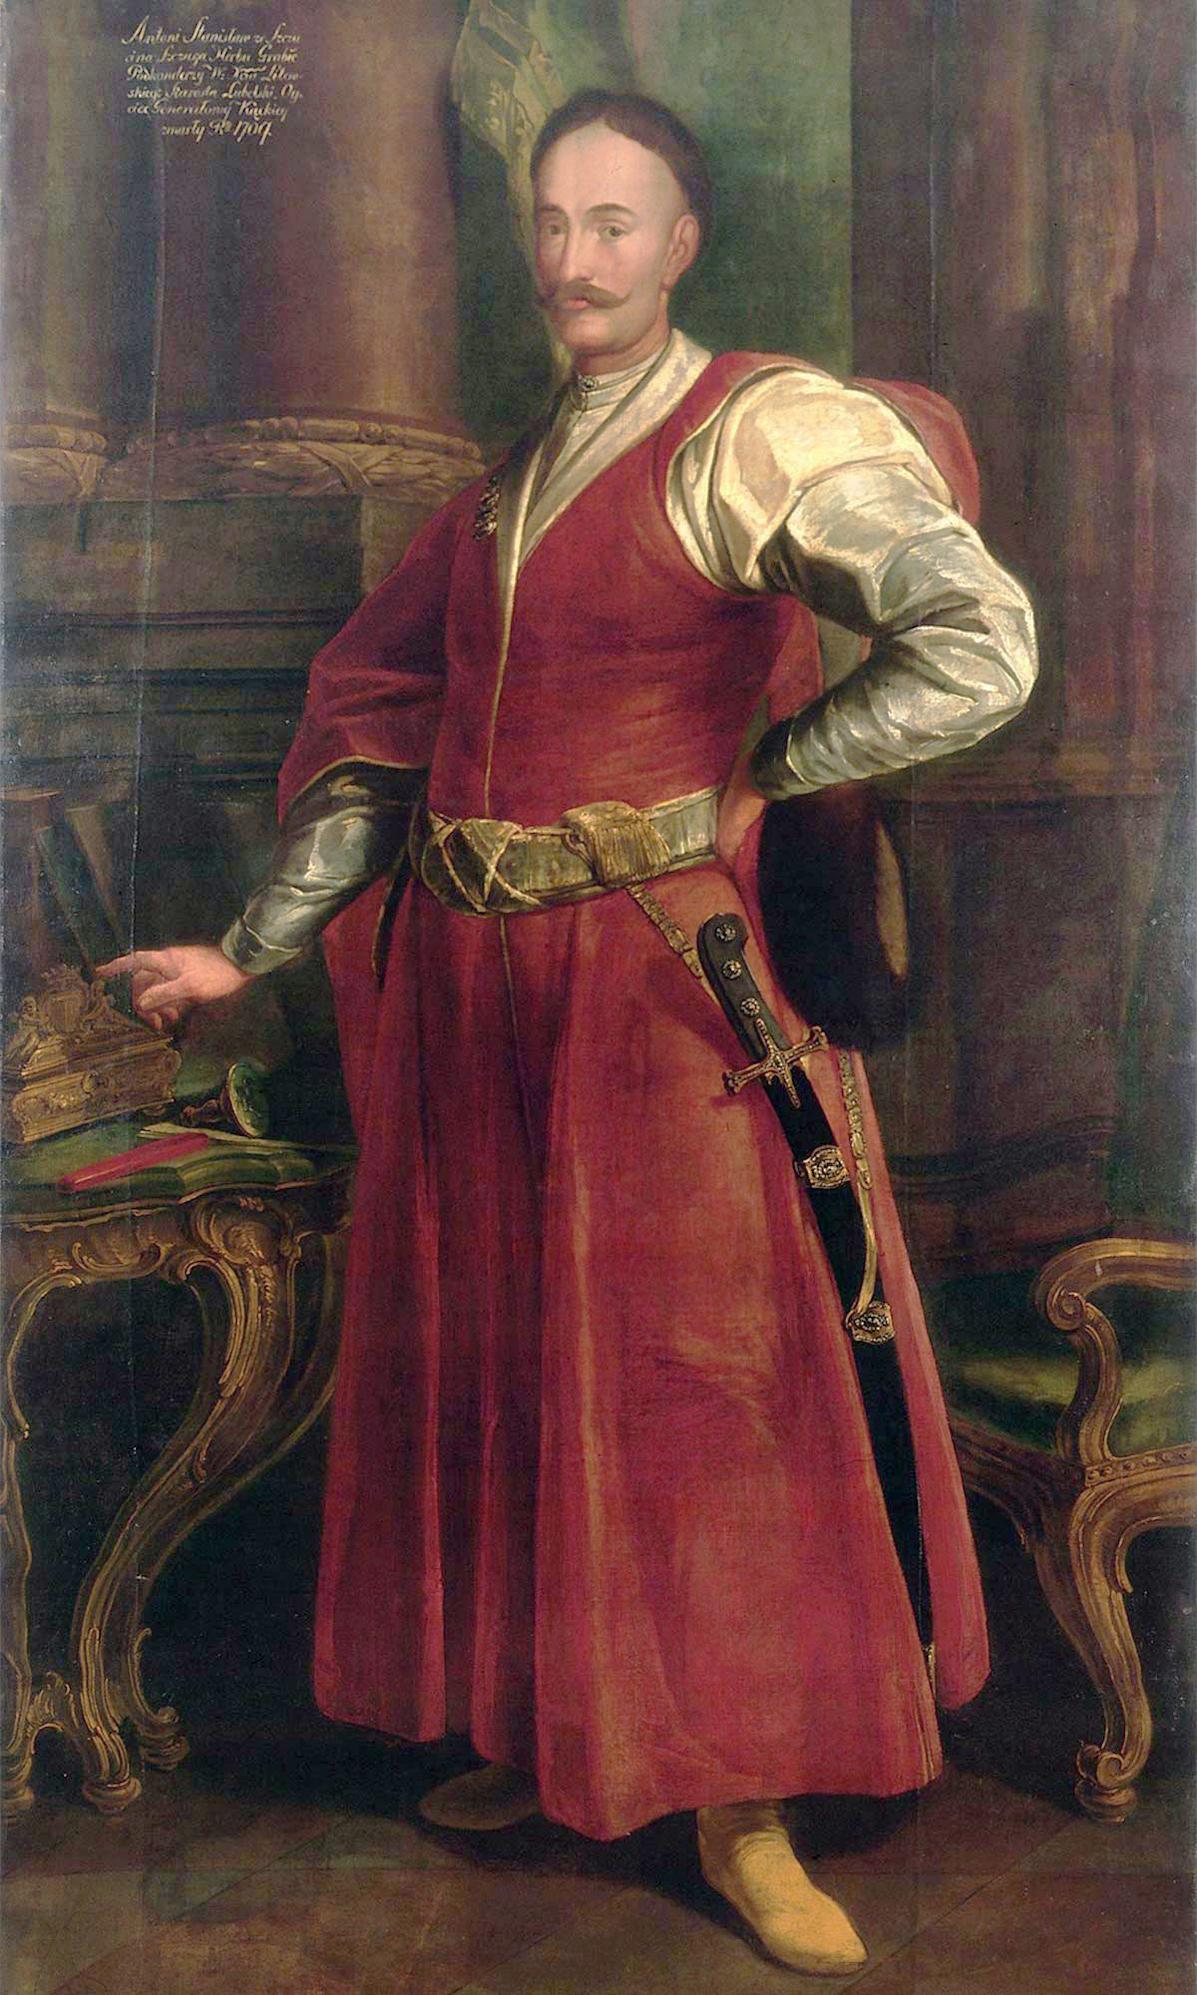 File:Stanislaw Antoni Szczuka (1652 1654-1710).jpg